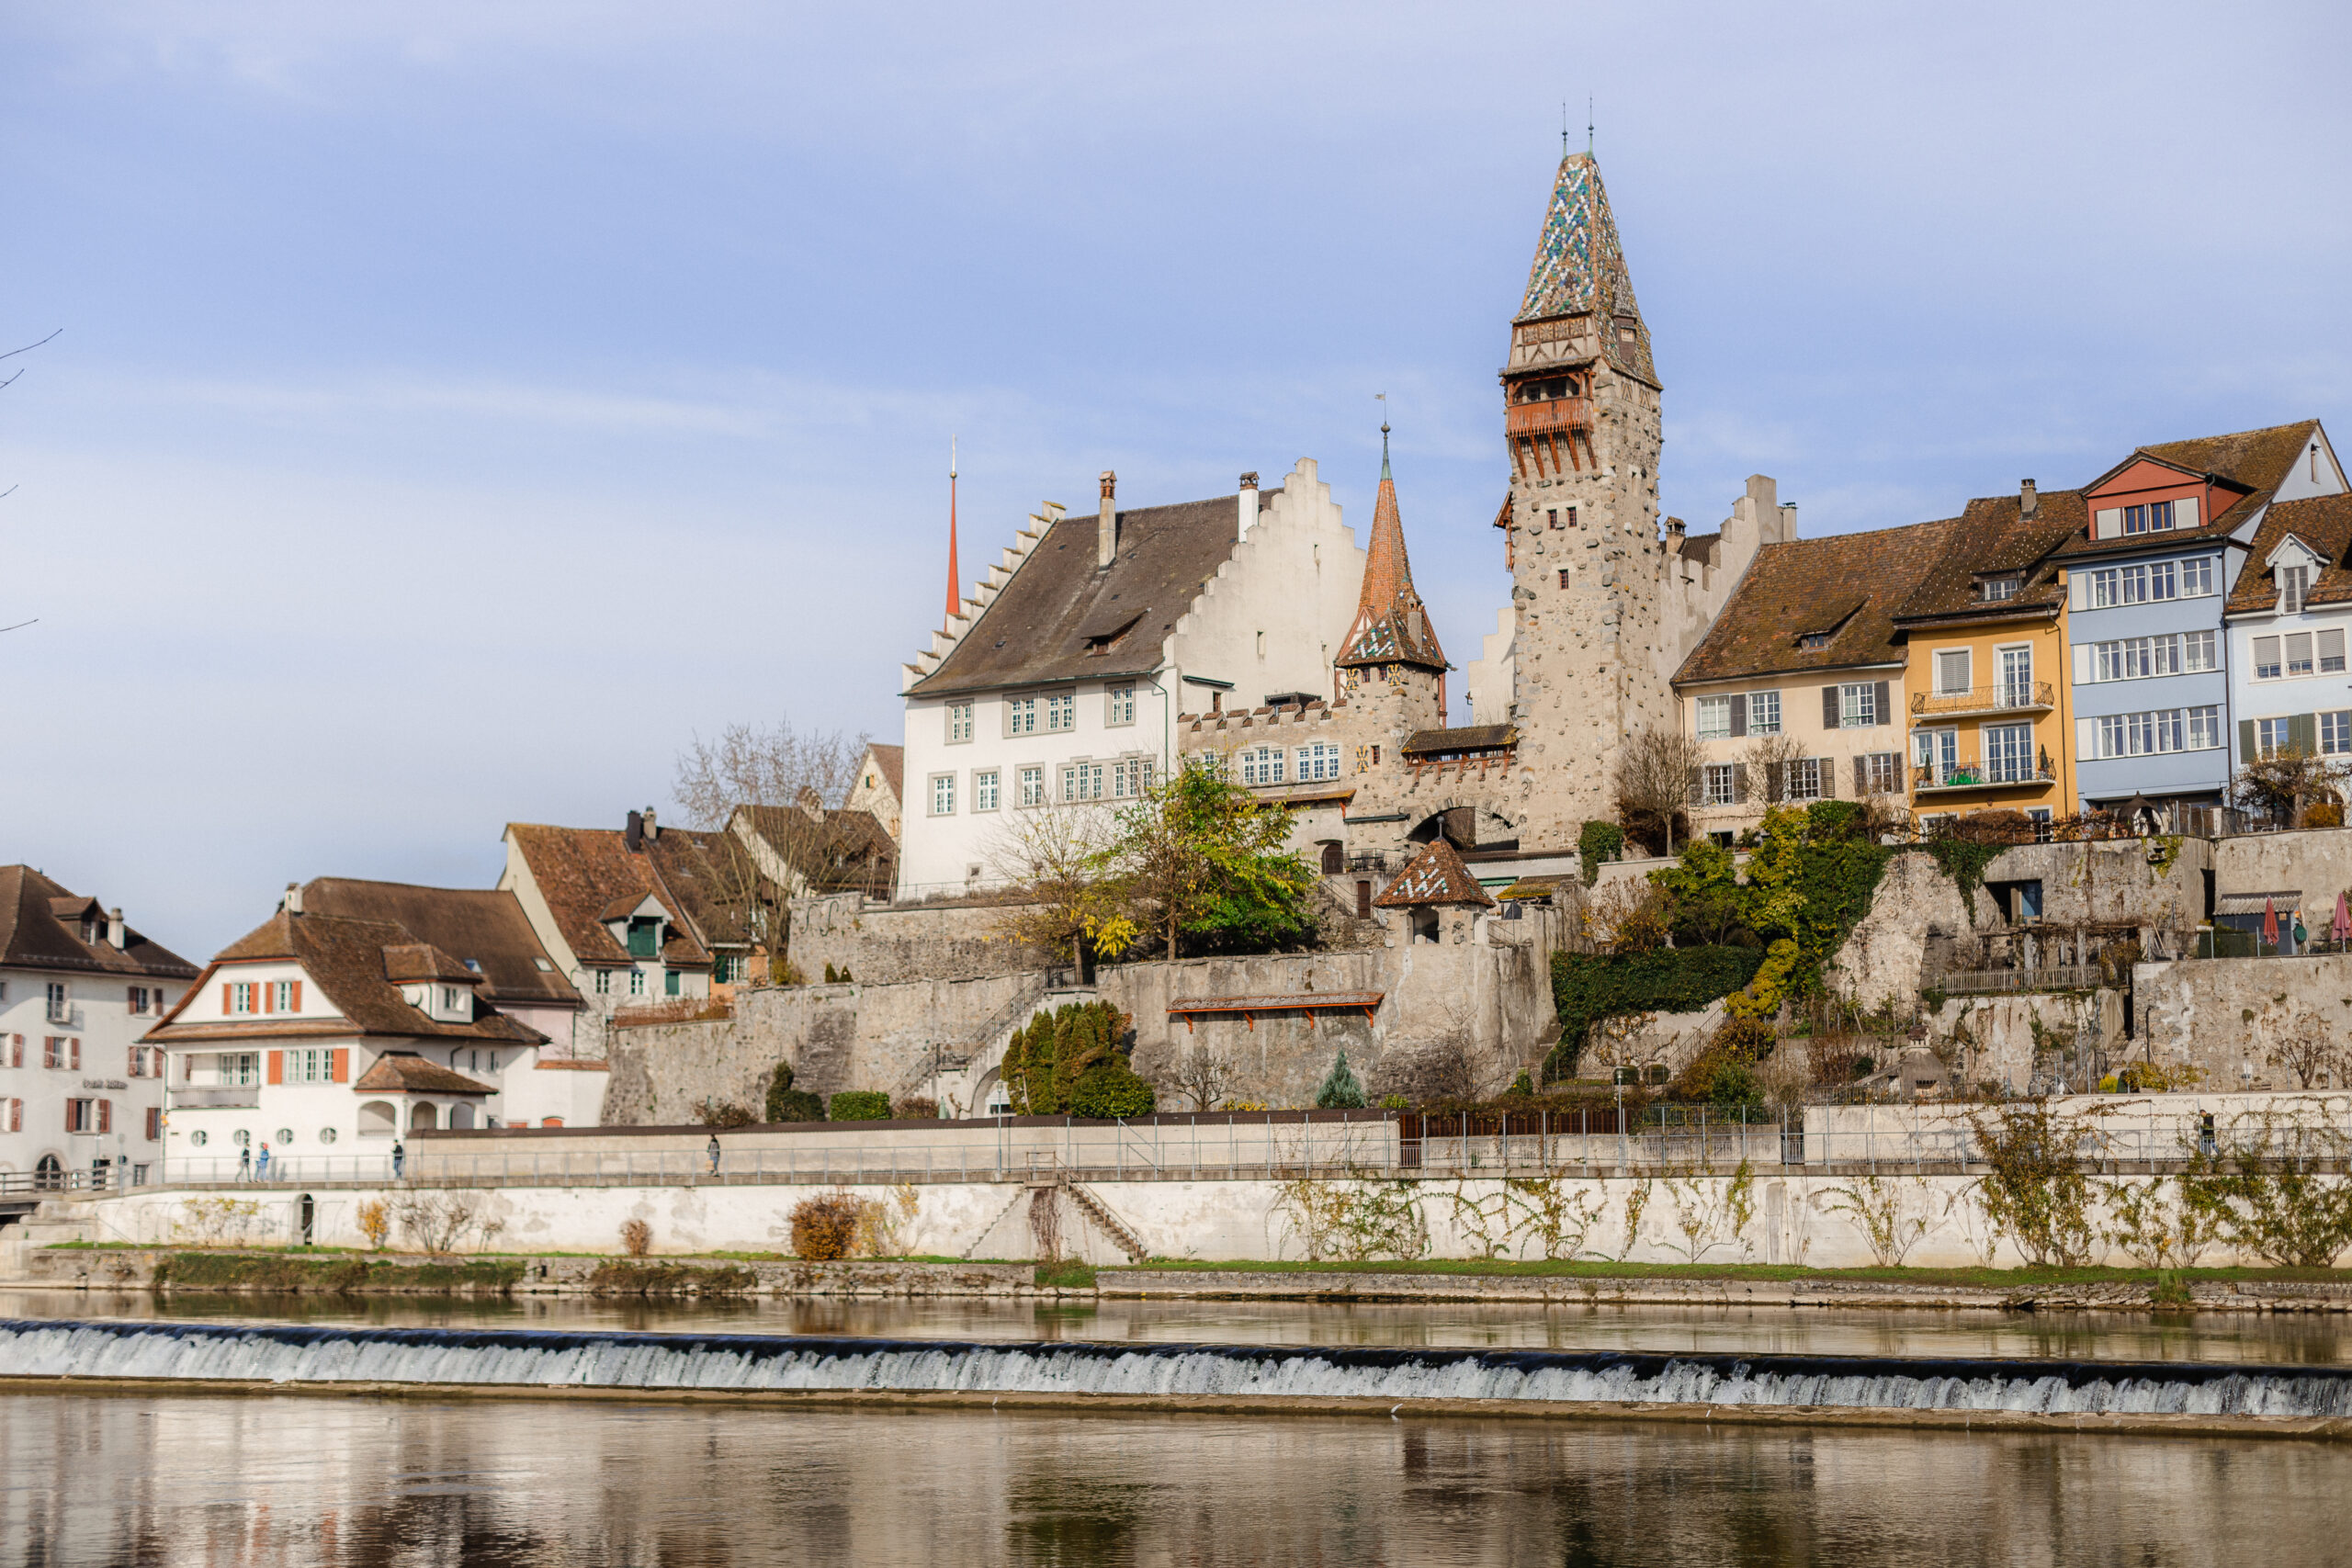 Historické městečko Bremgarten, AG